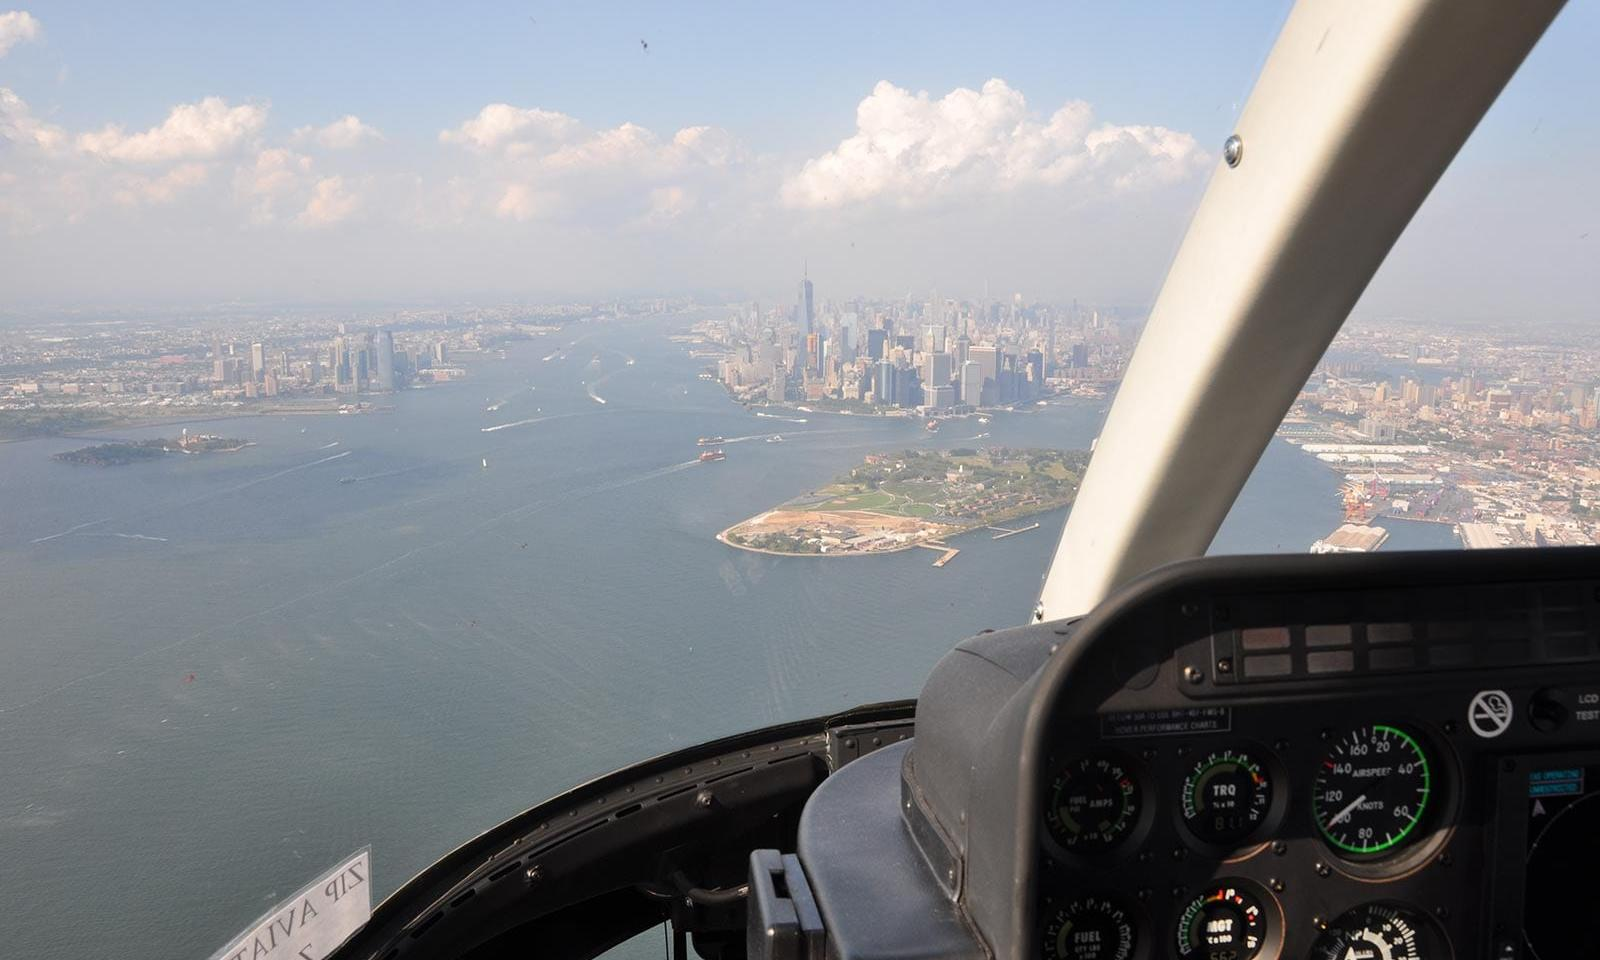 Helikopterflug New York Bilder 08